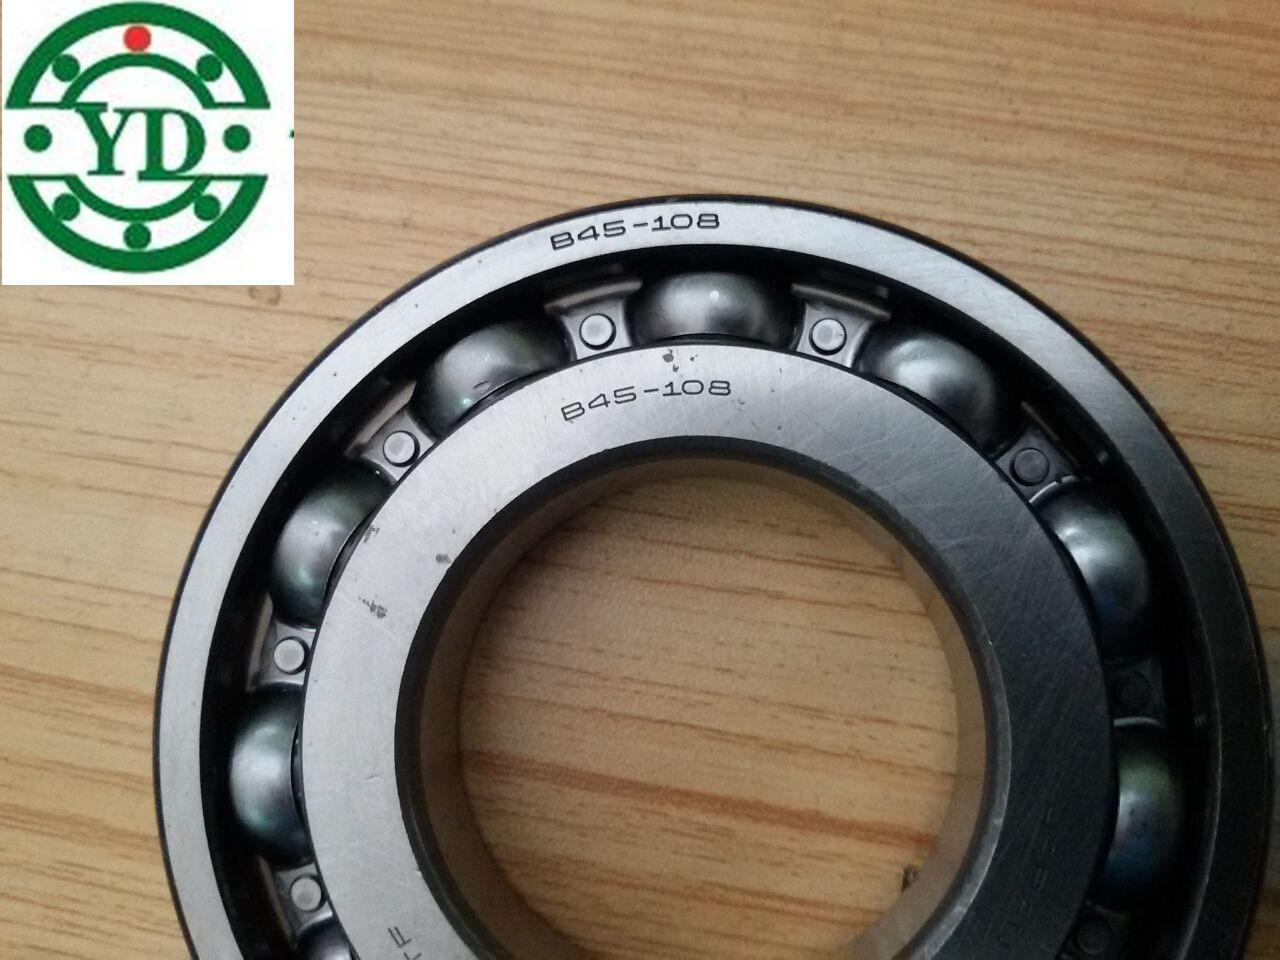 NSK Deep Groove Ball Bearing Auto Bearing B45-108 45*90*17